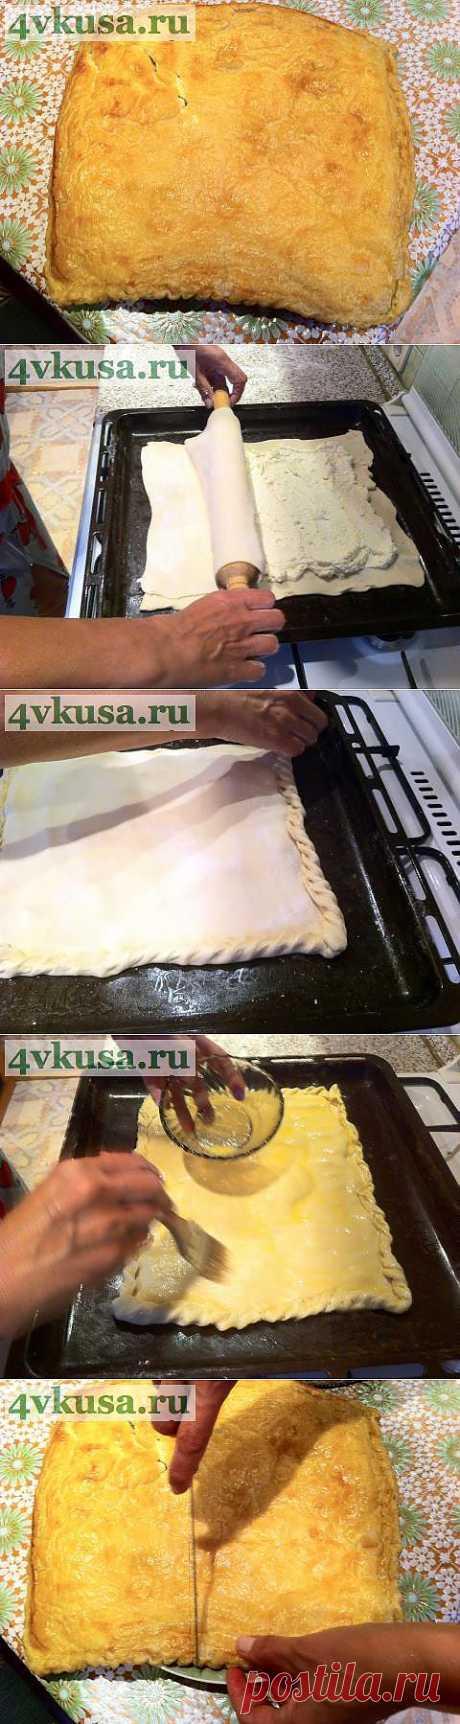 Хачапури из слоеного теста. | 4vkusa.ru